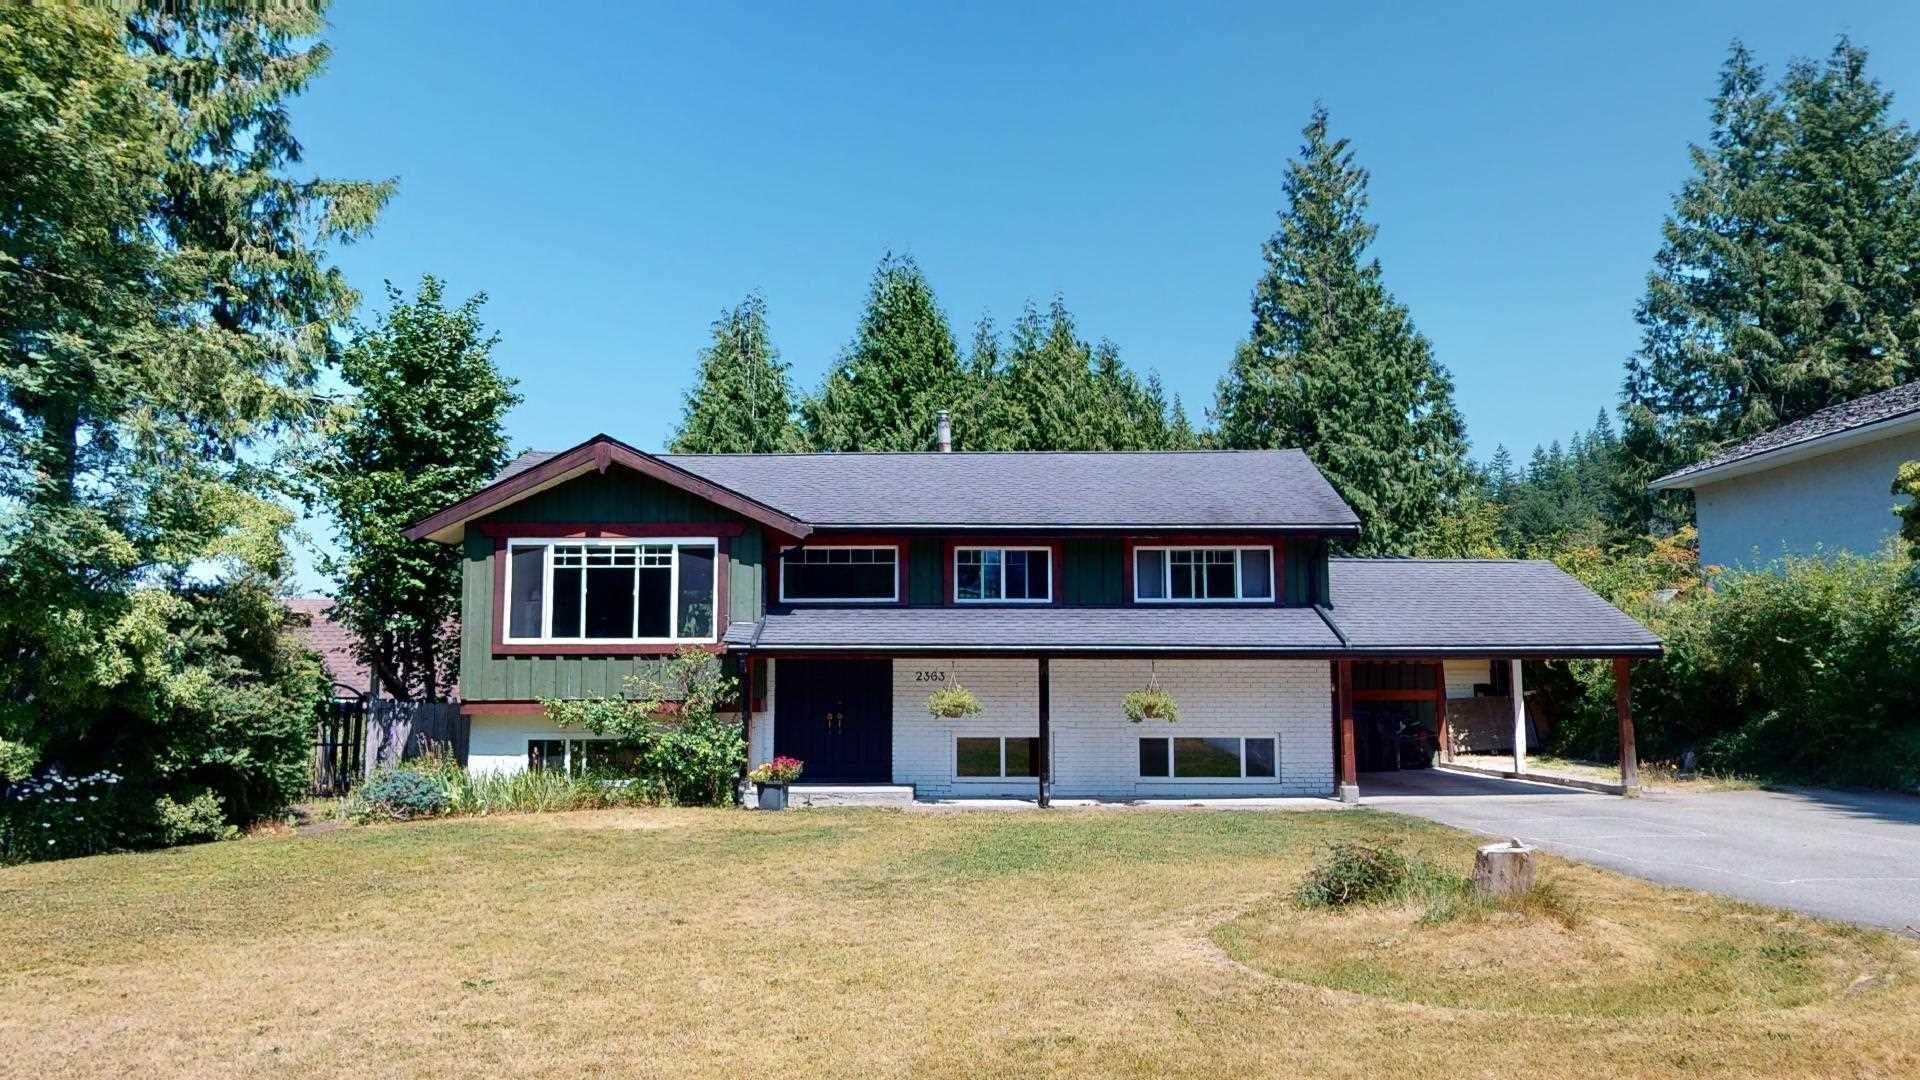 "Main Photo: 2363 THE BOULEVARD in Squamish: Garibaldi Highlands House for sale in ""Garibaldi Highlands"" : MLS®# R2602086"